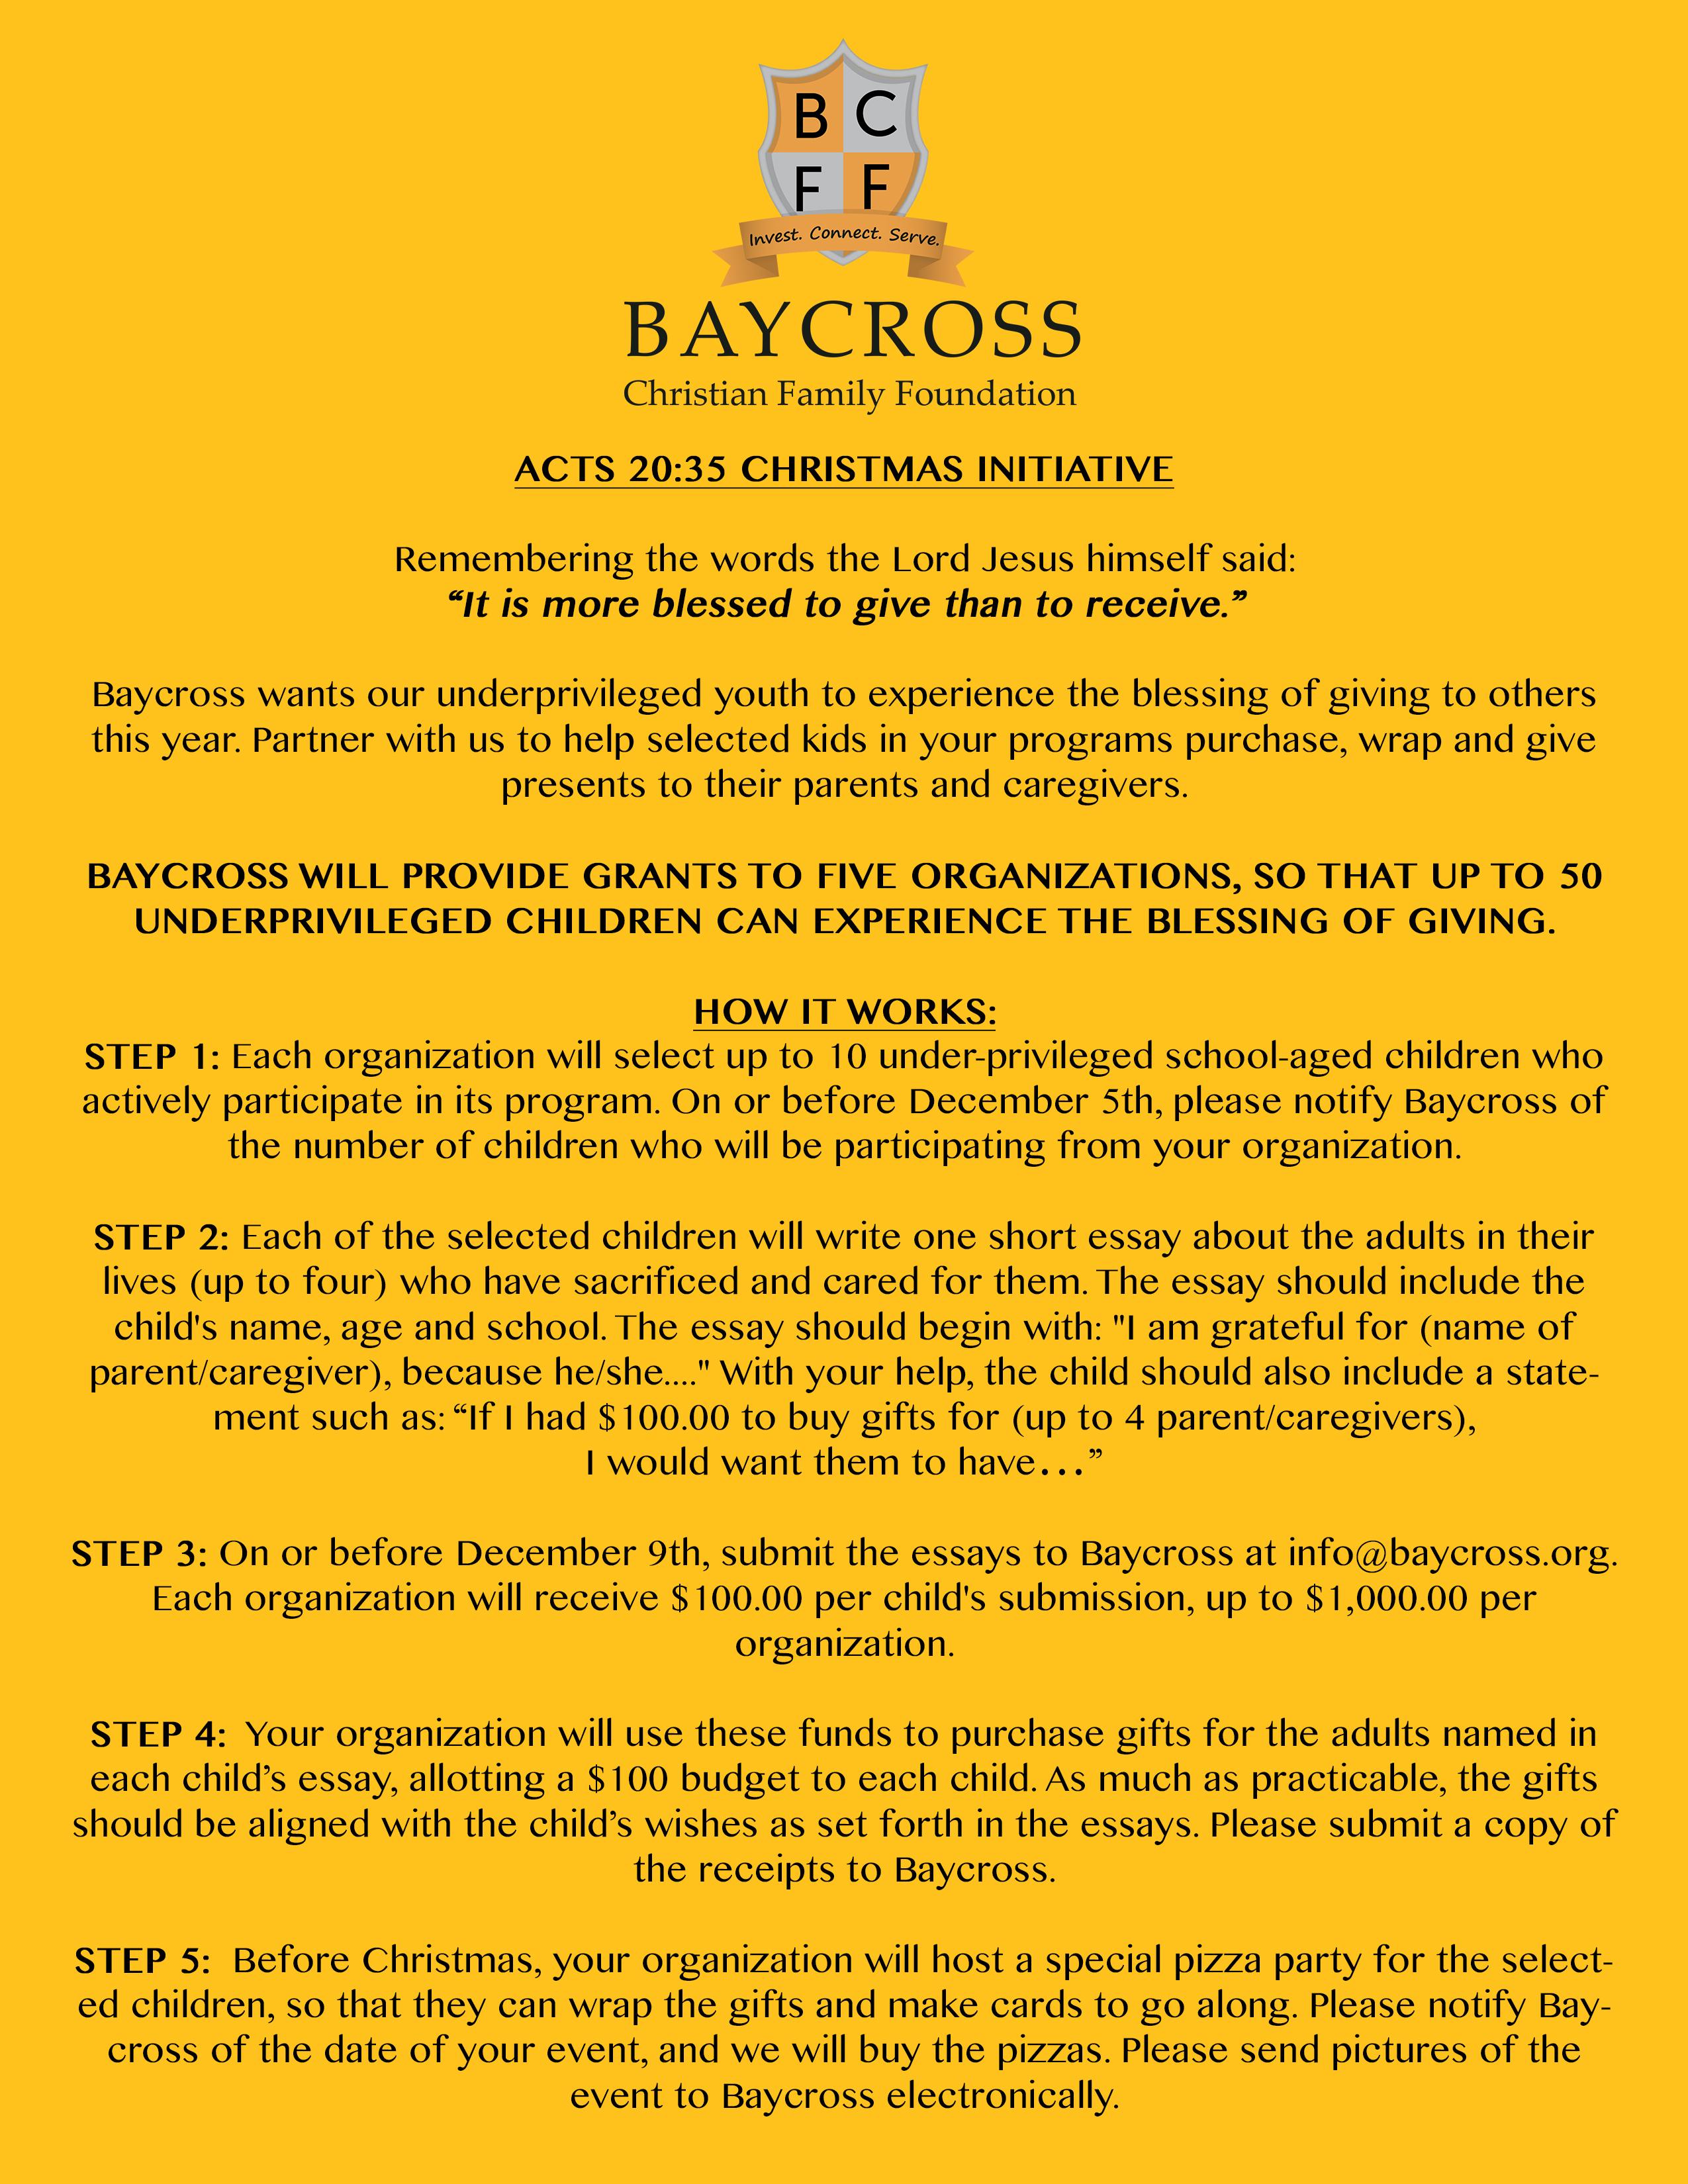 Acts 20:35 Christmas Initiative - Baycross Christian Family